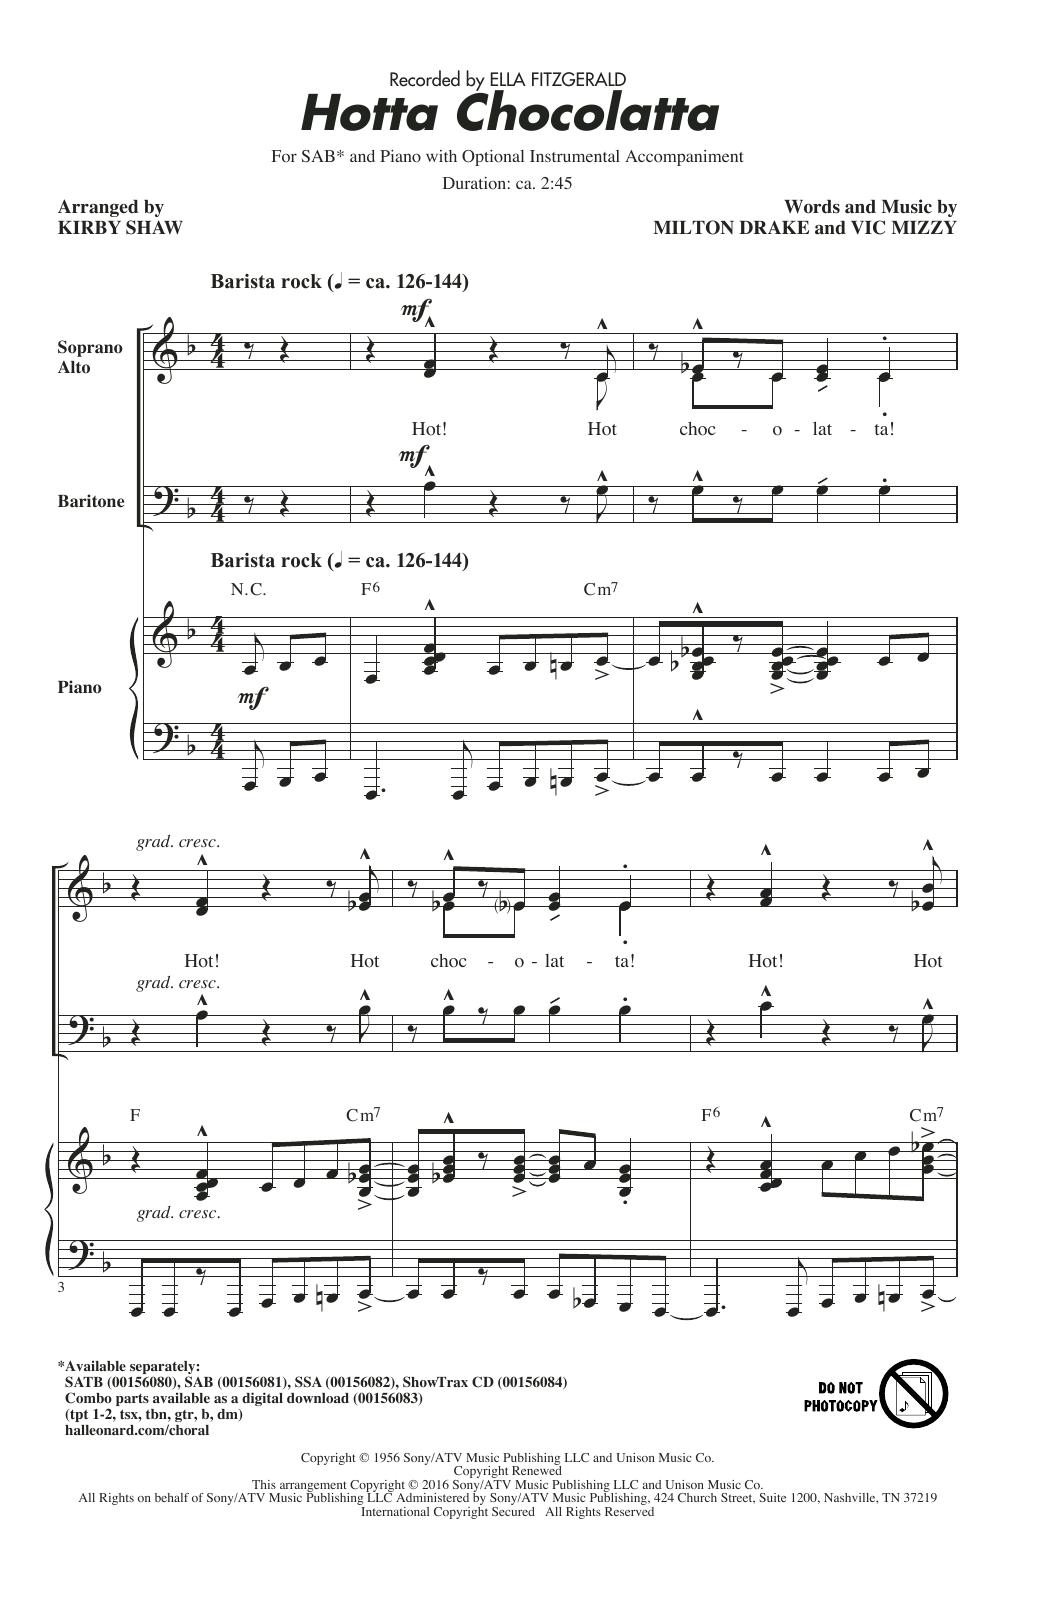 Sheet Music Digital Files To Print Licensed Milton Drake Digital